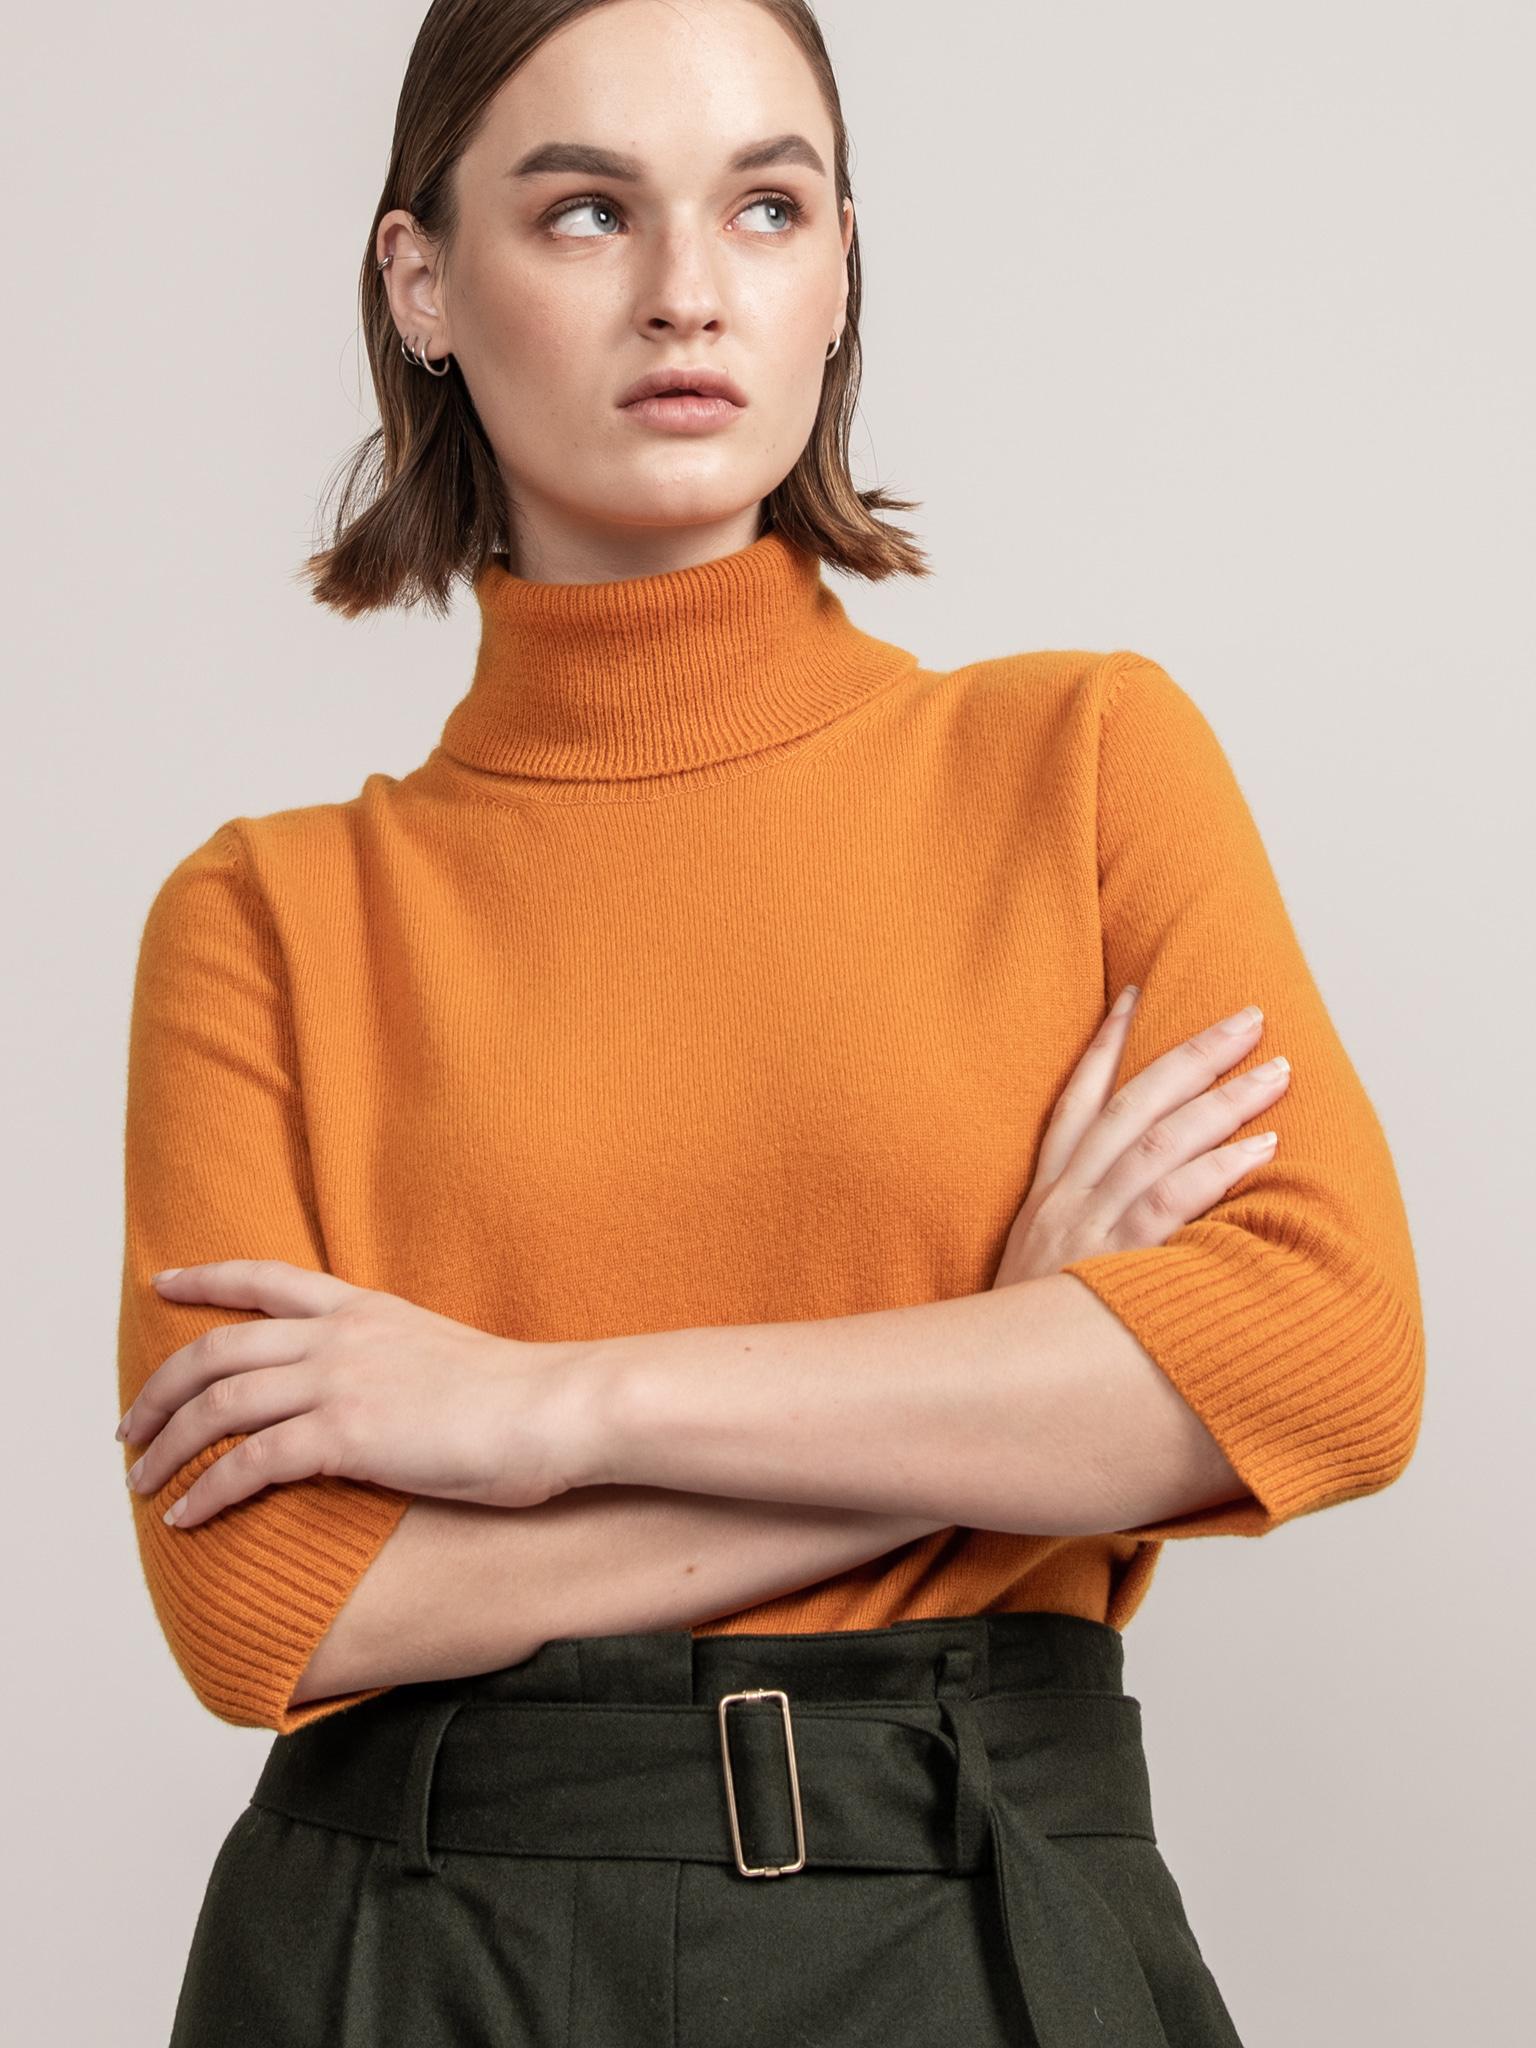 ROYAL Collection. Loro Piana Cashmere 100%Royal Classic Short Sleeve Turtleneck